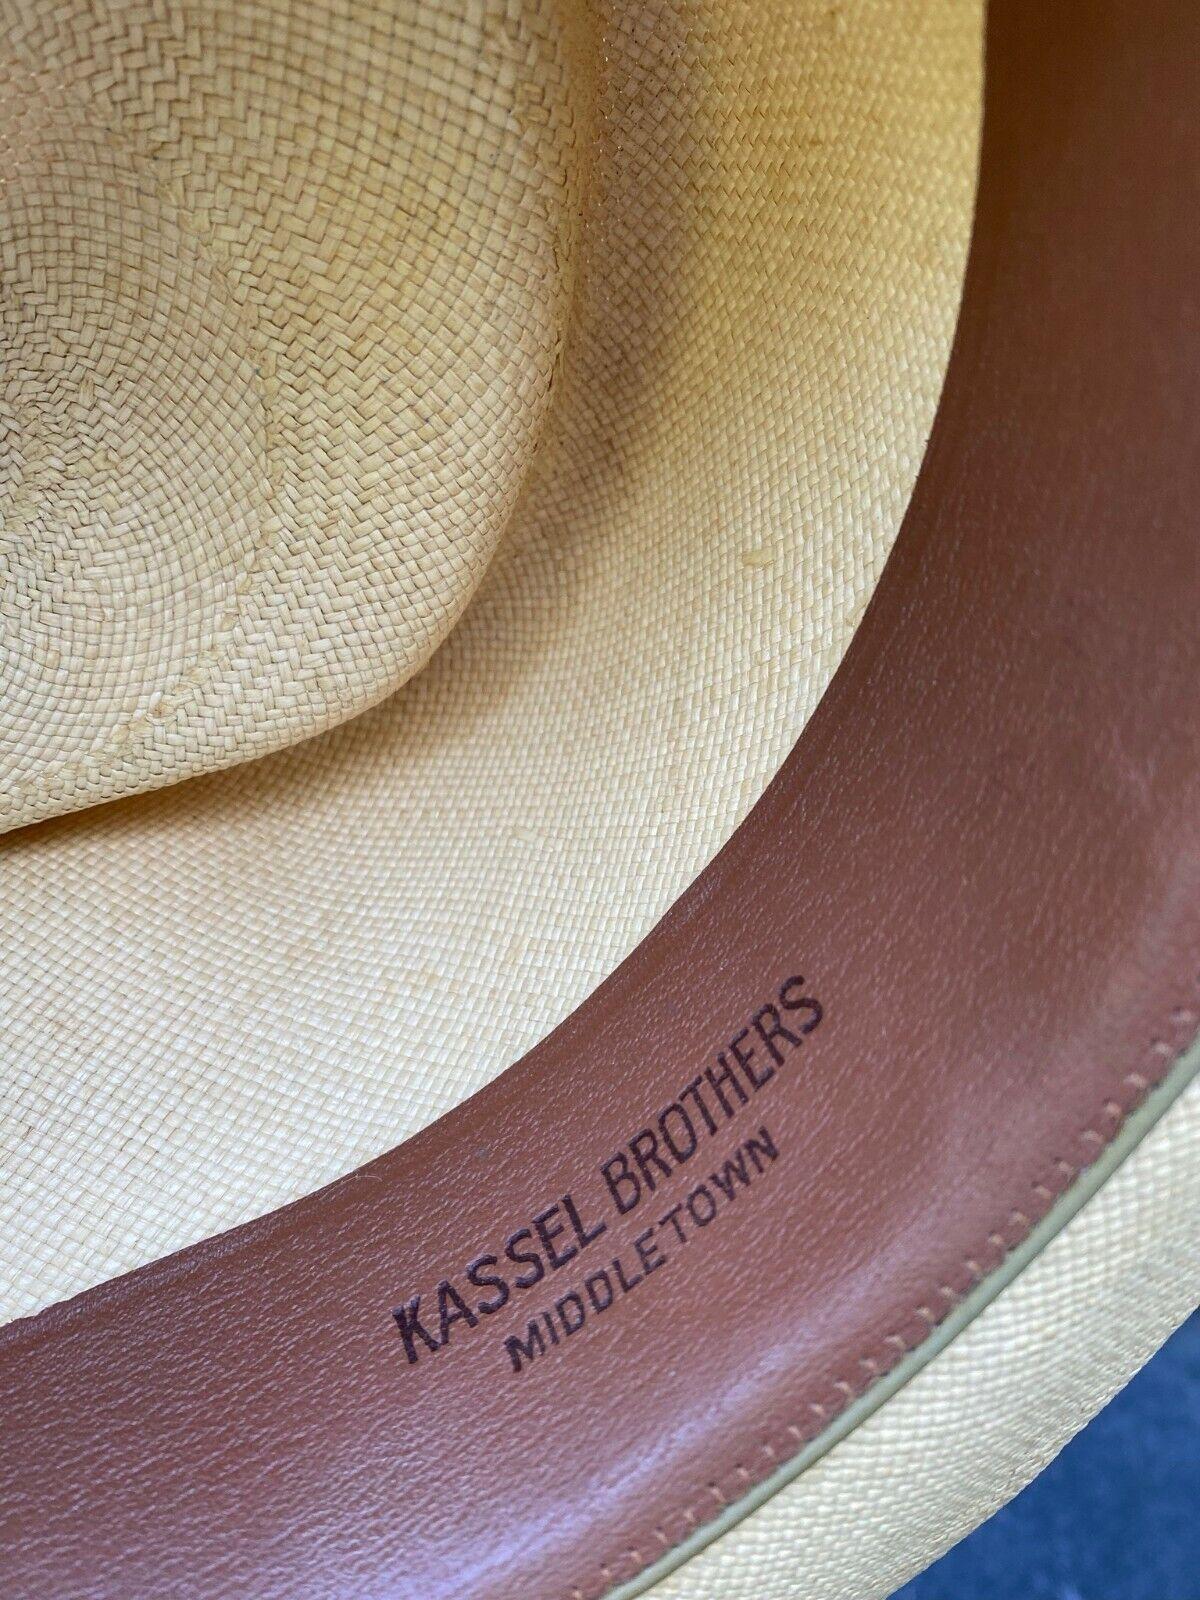 Vintage Stetson Wide Brim Straw Hat with box - image 1